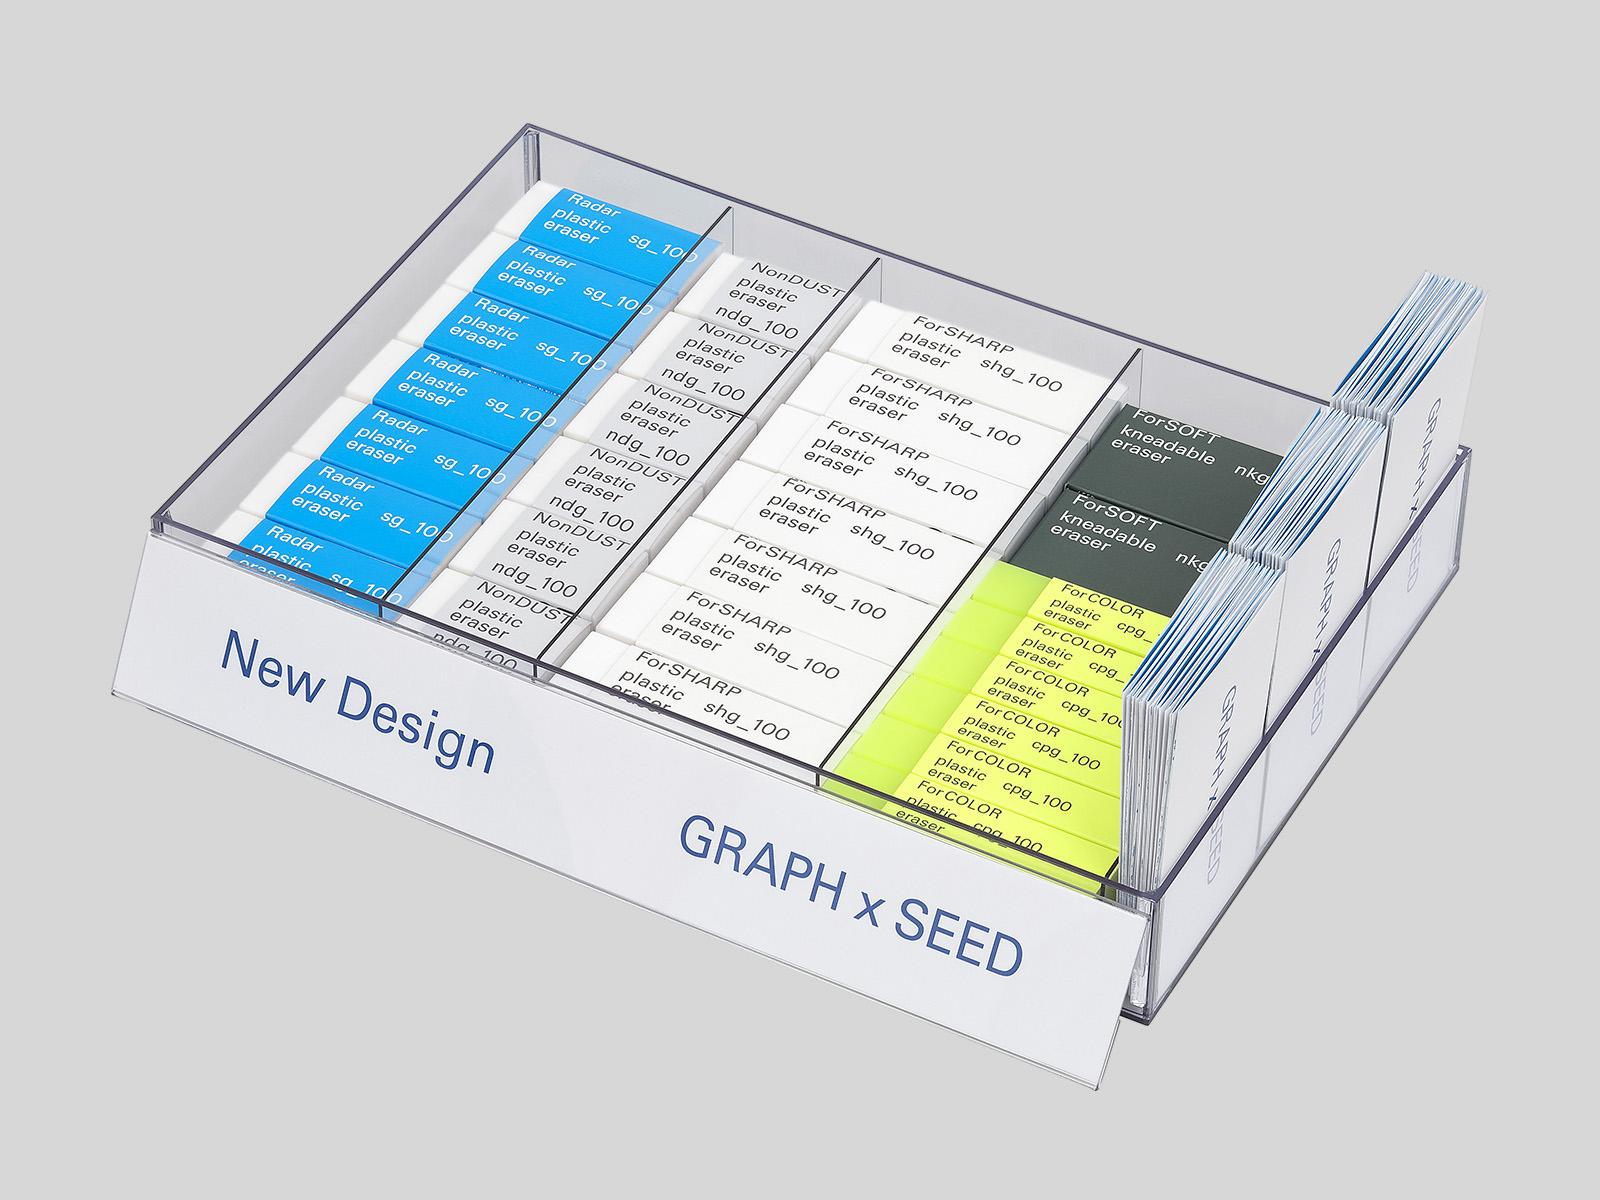 works_seed_02